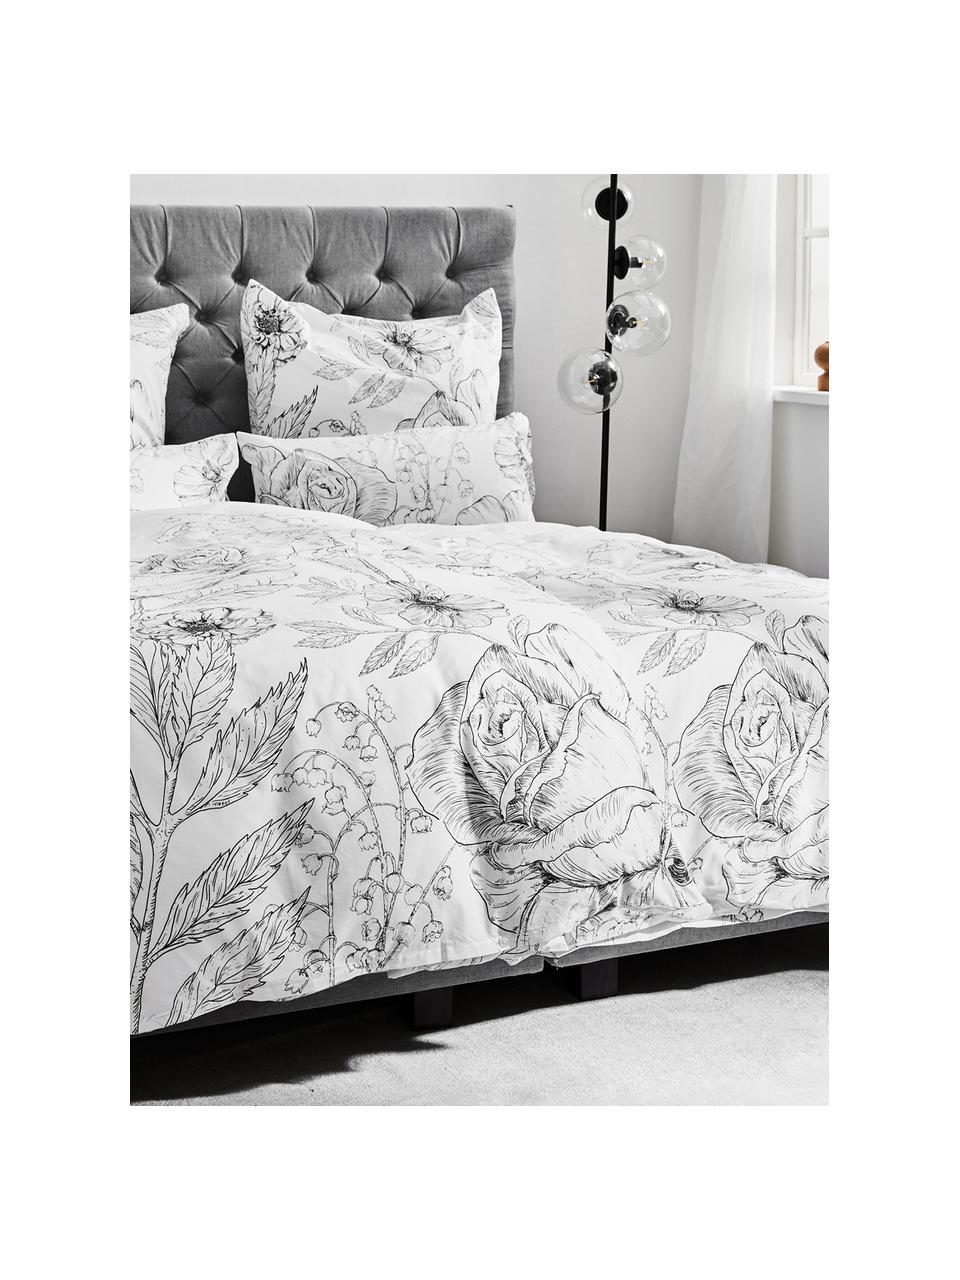 Baumwollperkal-Bettwäsche Keno mit Blumenprint, Webart: Perkal Fadendichte 180 TC, Weiß, Grau, 135 x 200 cm + 1 Kissen 80 x 80 cm